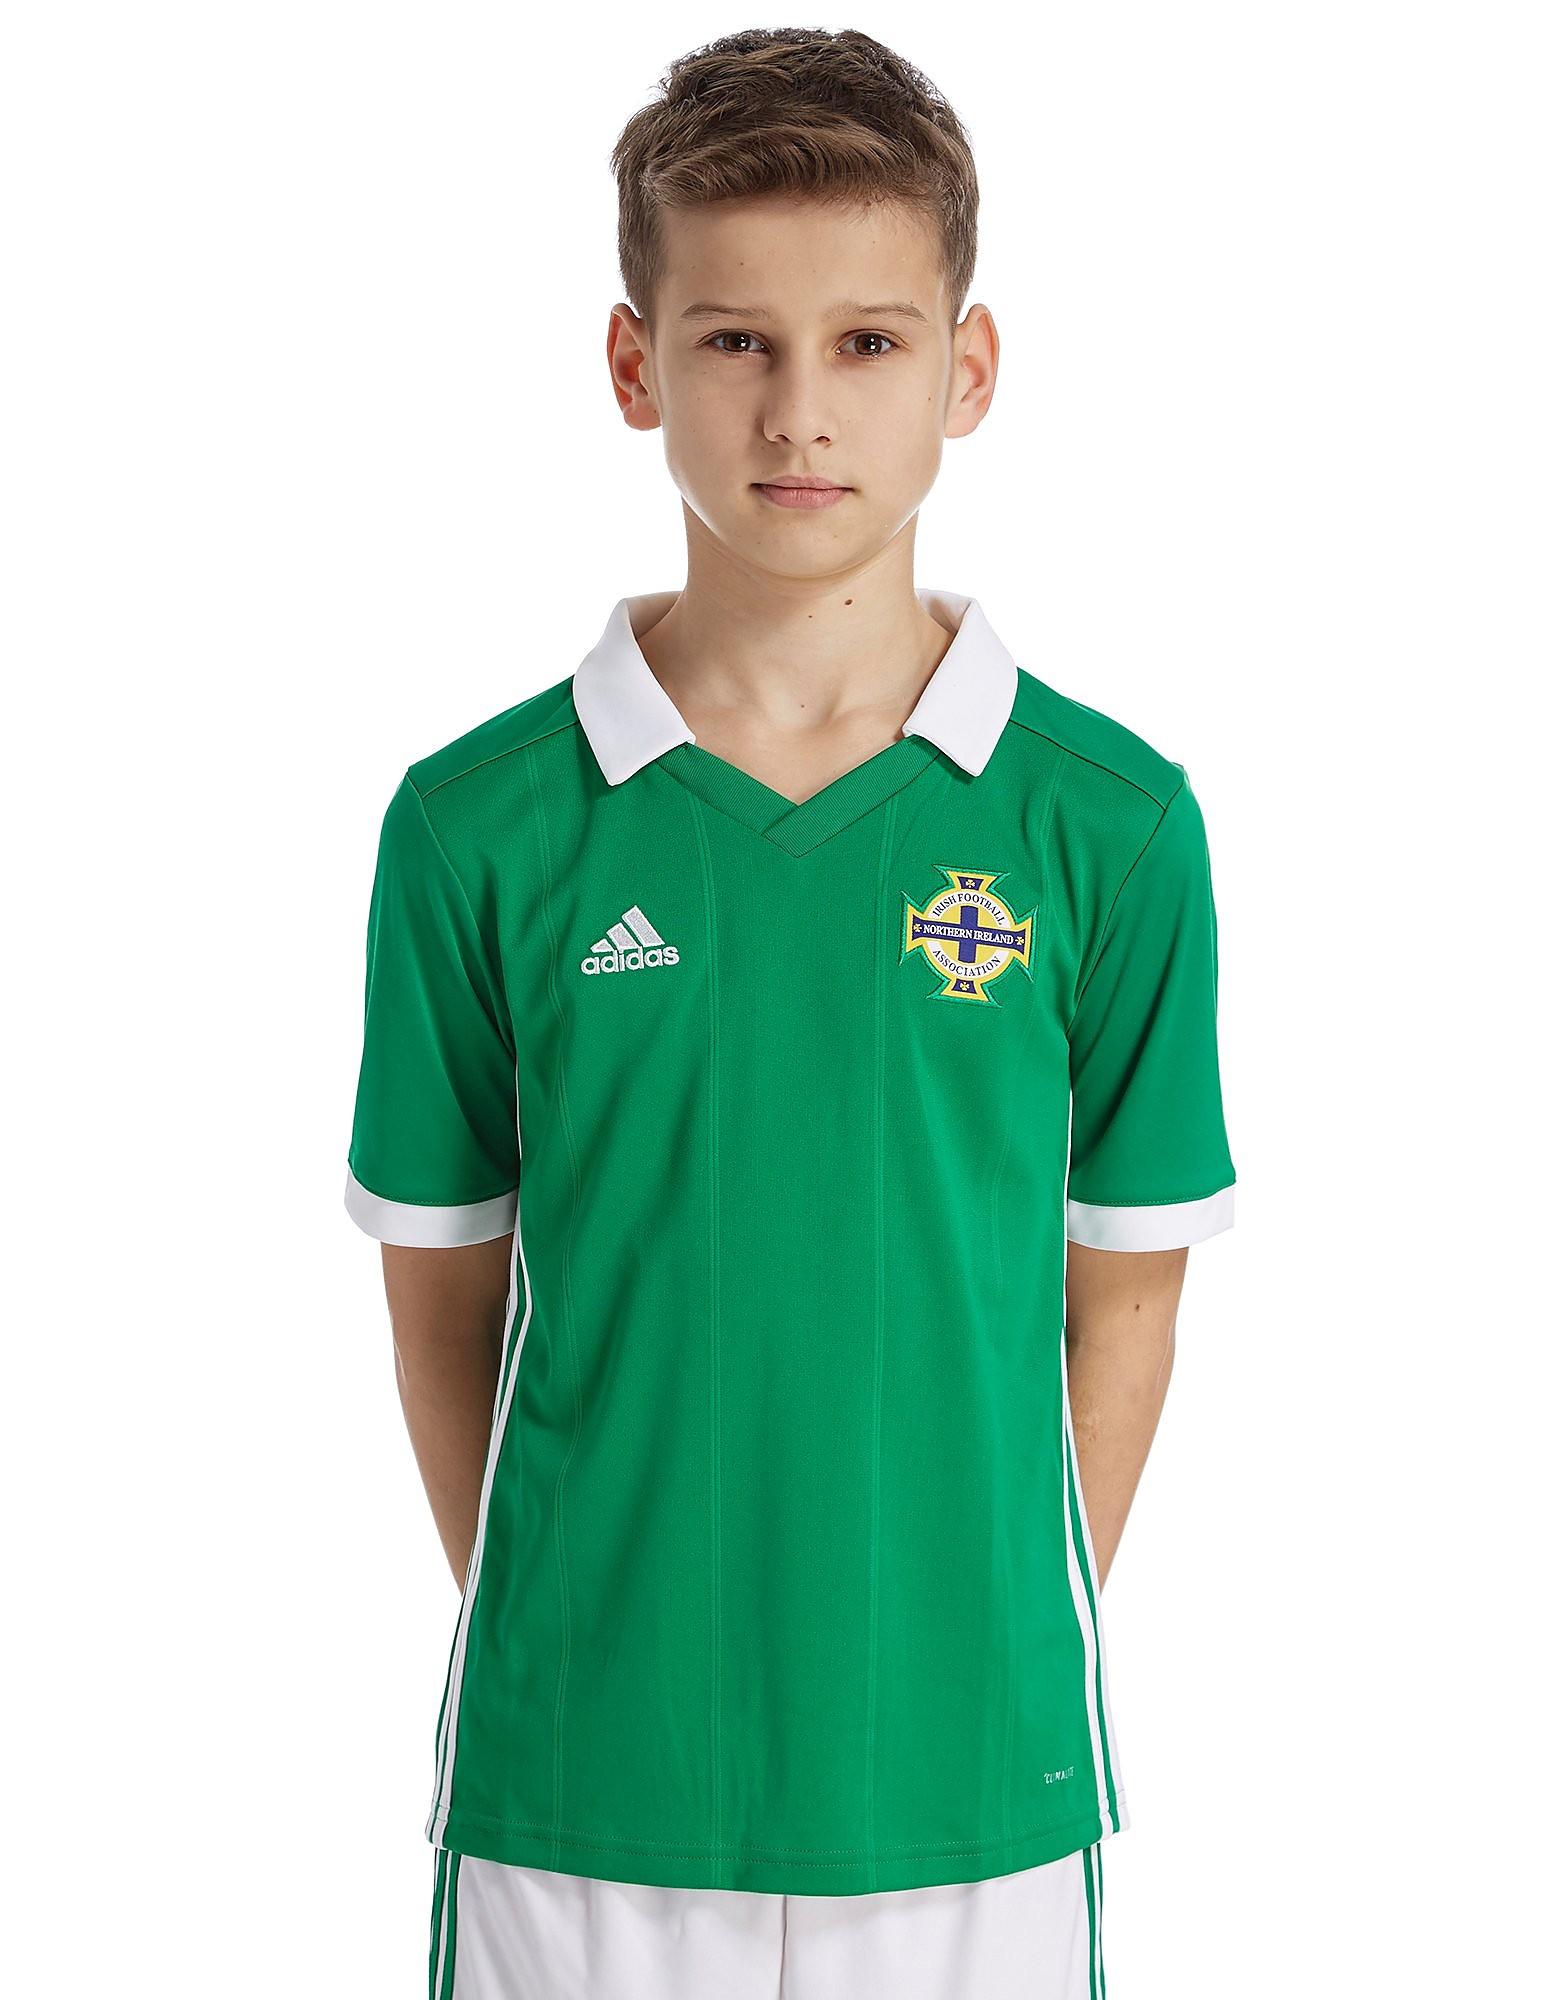 adidas Northern Ireland 2017/18 Home Shirt Junior - Groen - Kind